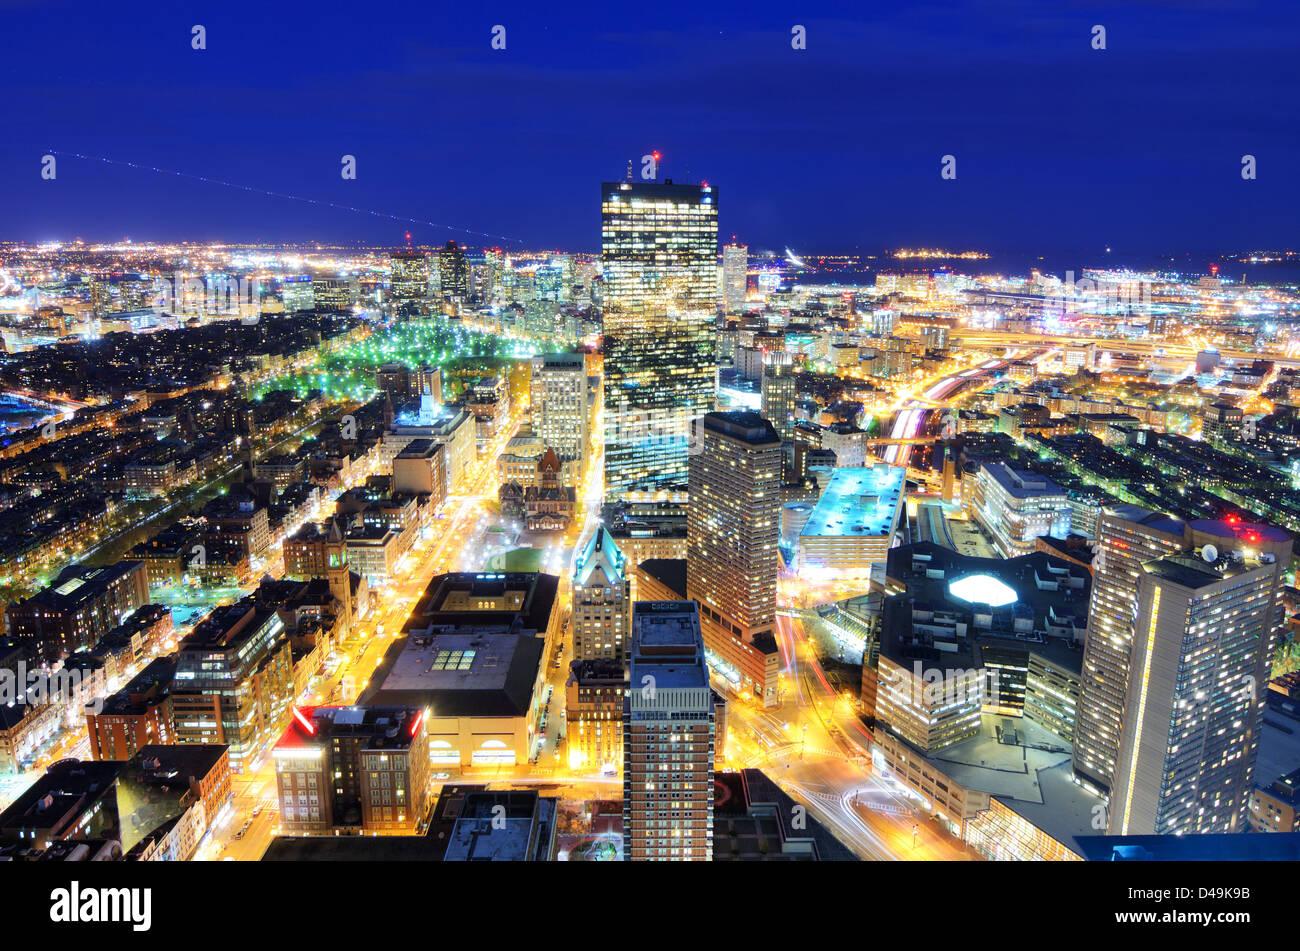 Luftaufnahme der Innenstadt von Boston, Massachusetts, USA. Stockbild